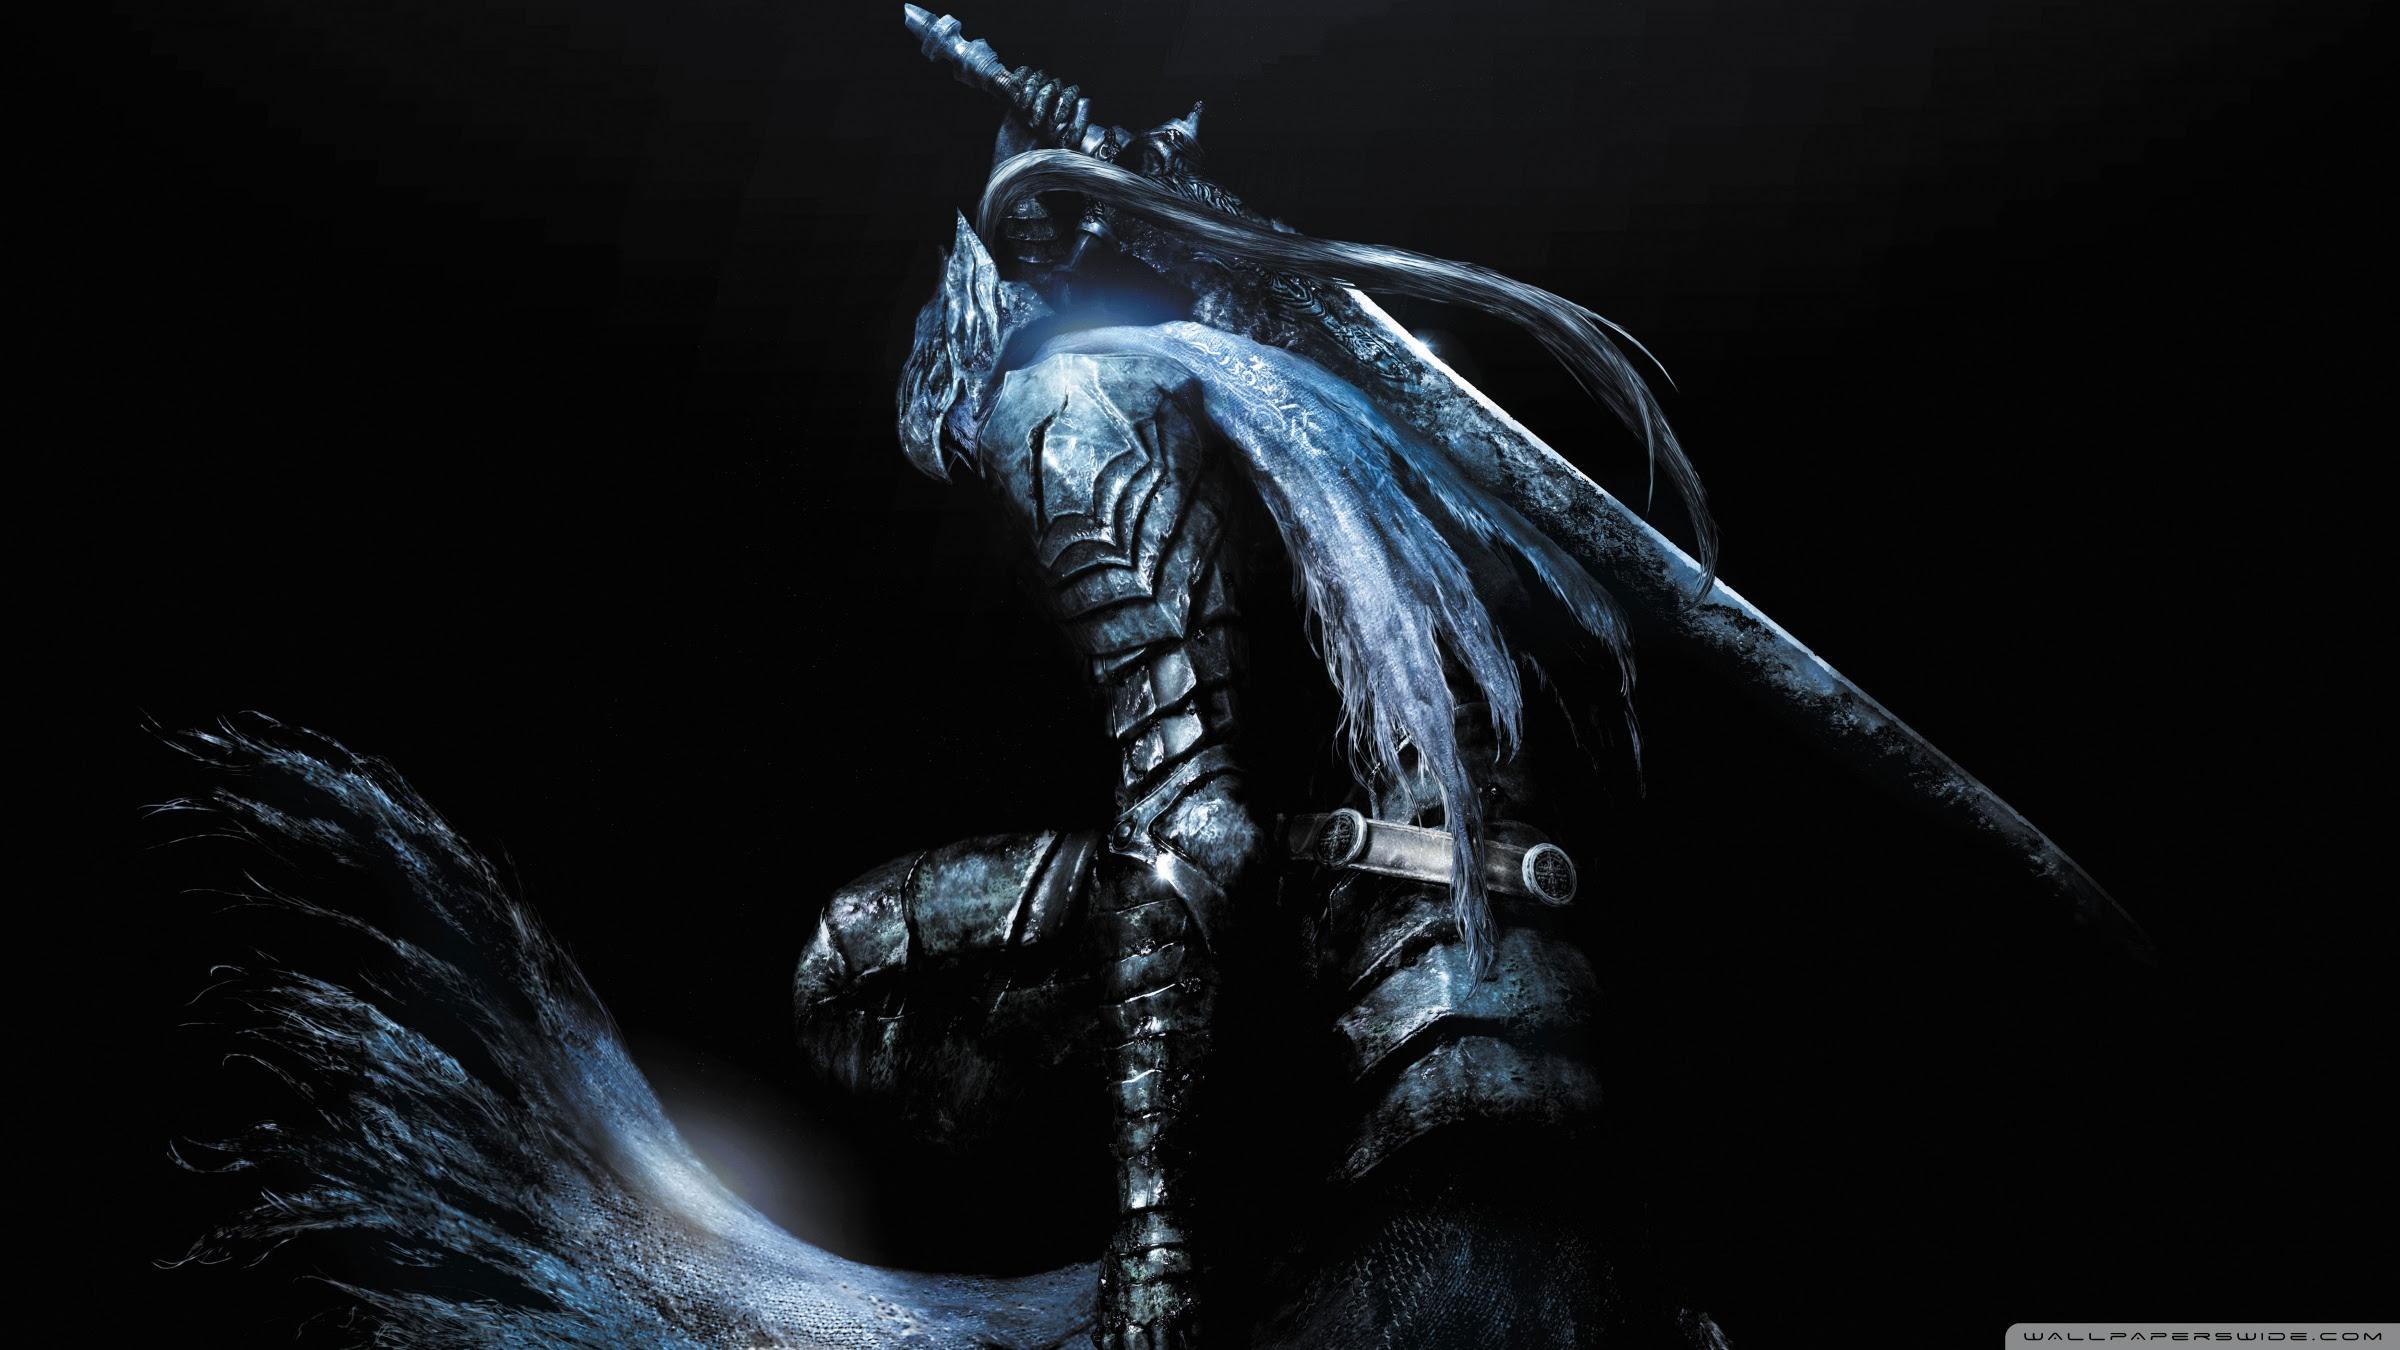 Dark Souls Ultra Hd Desktop Background Wallpaper For 4k Uhd Tv